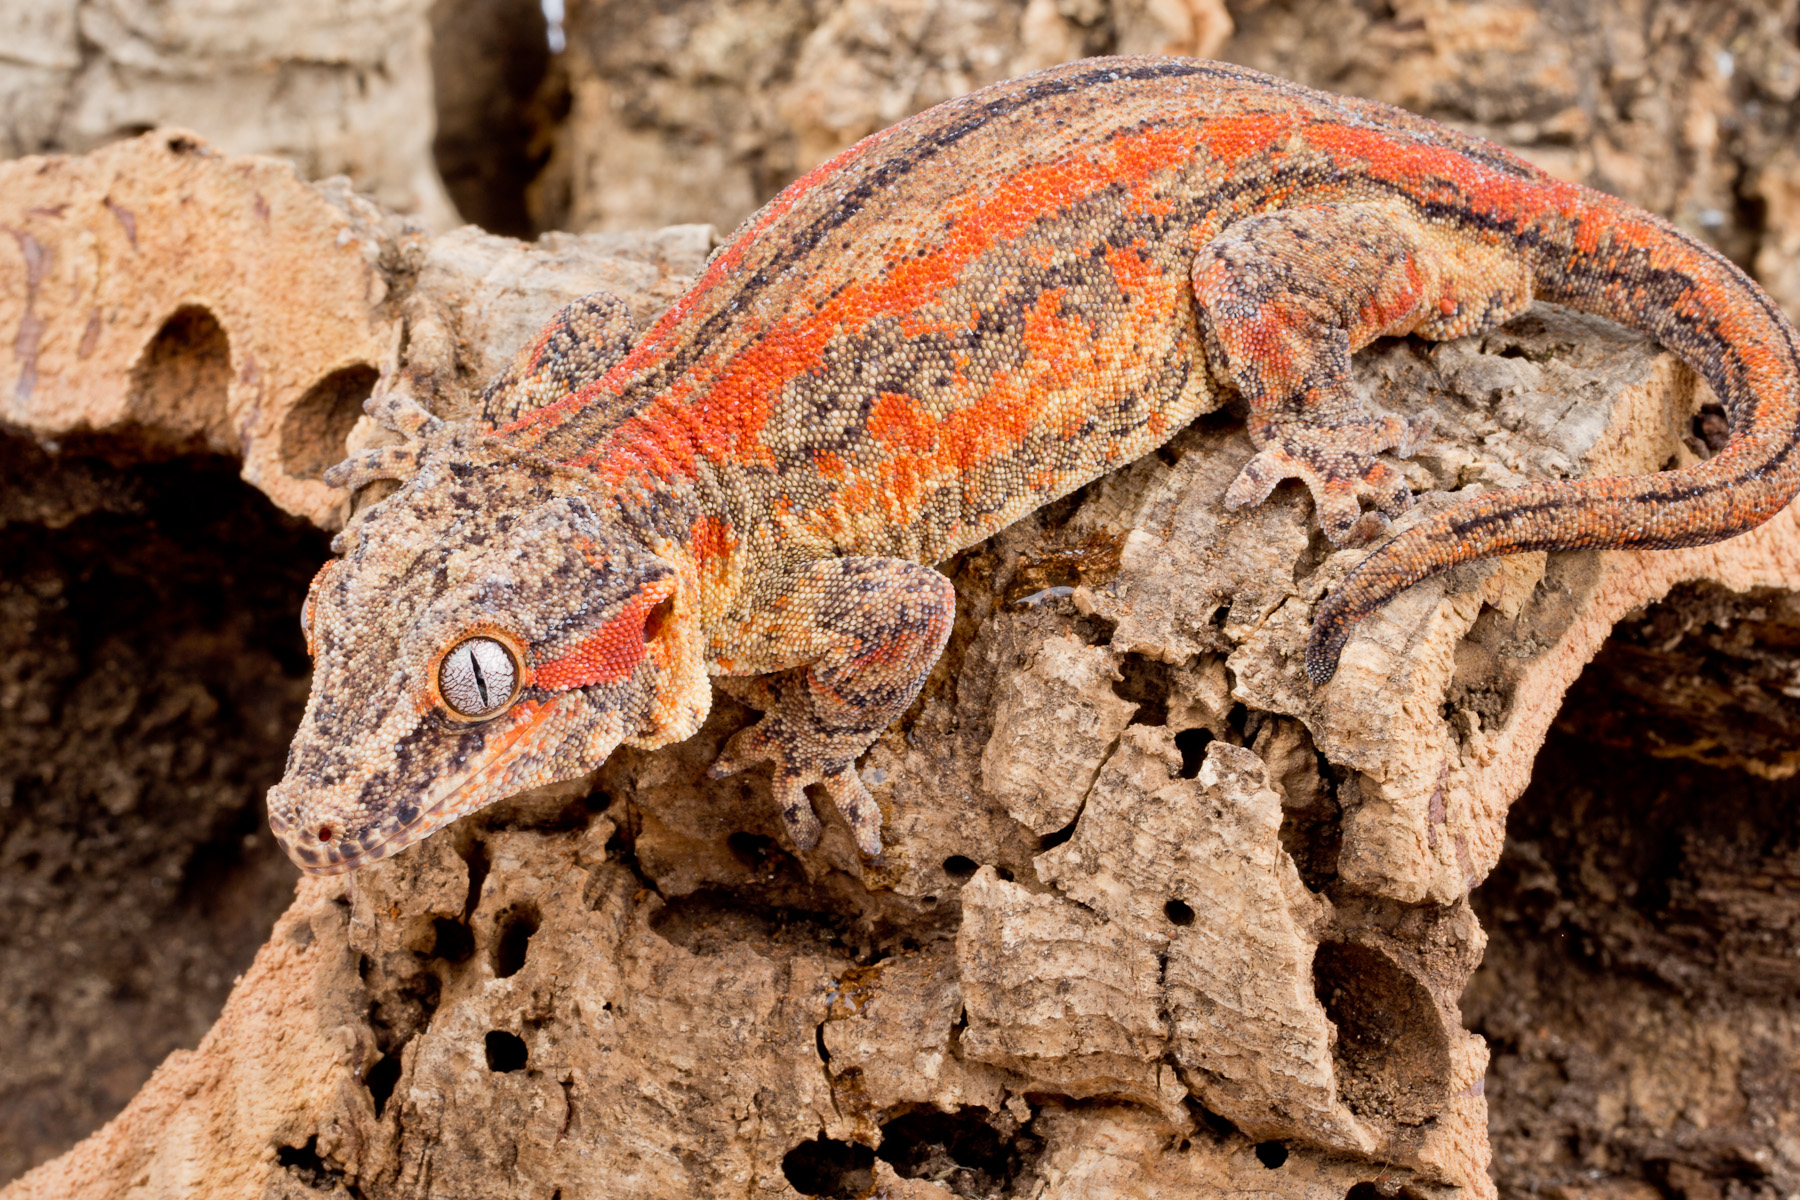 Group 1 red/orange-striped female